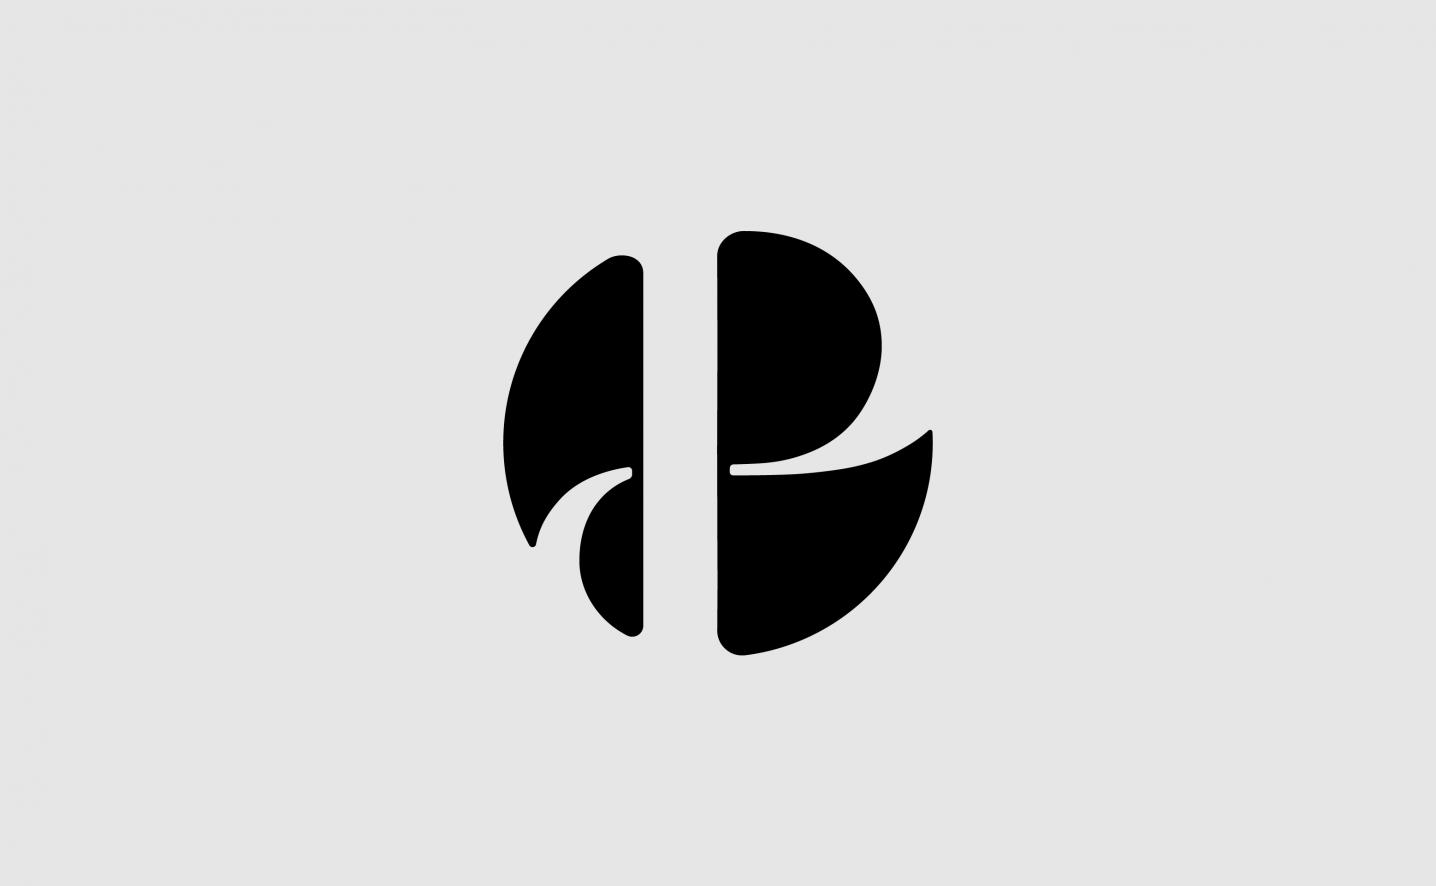 Penn dairy logo design